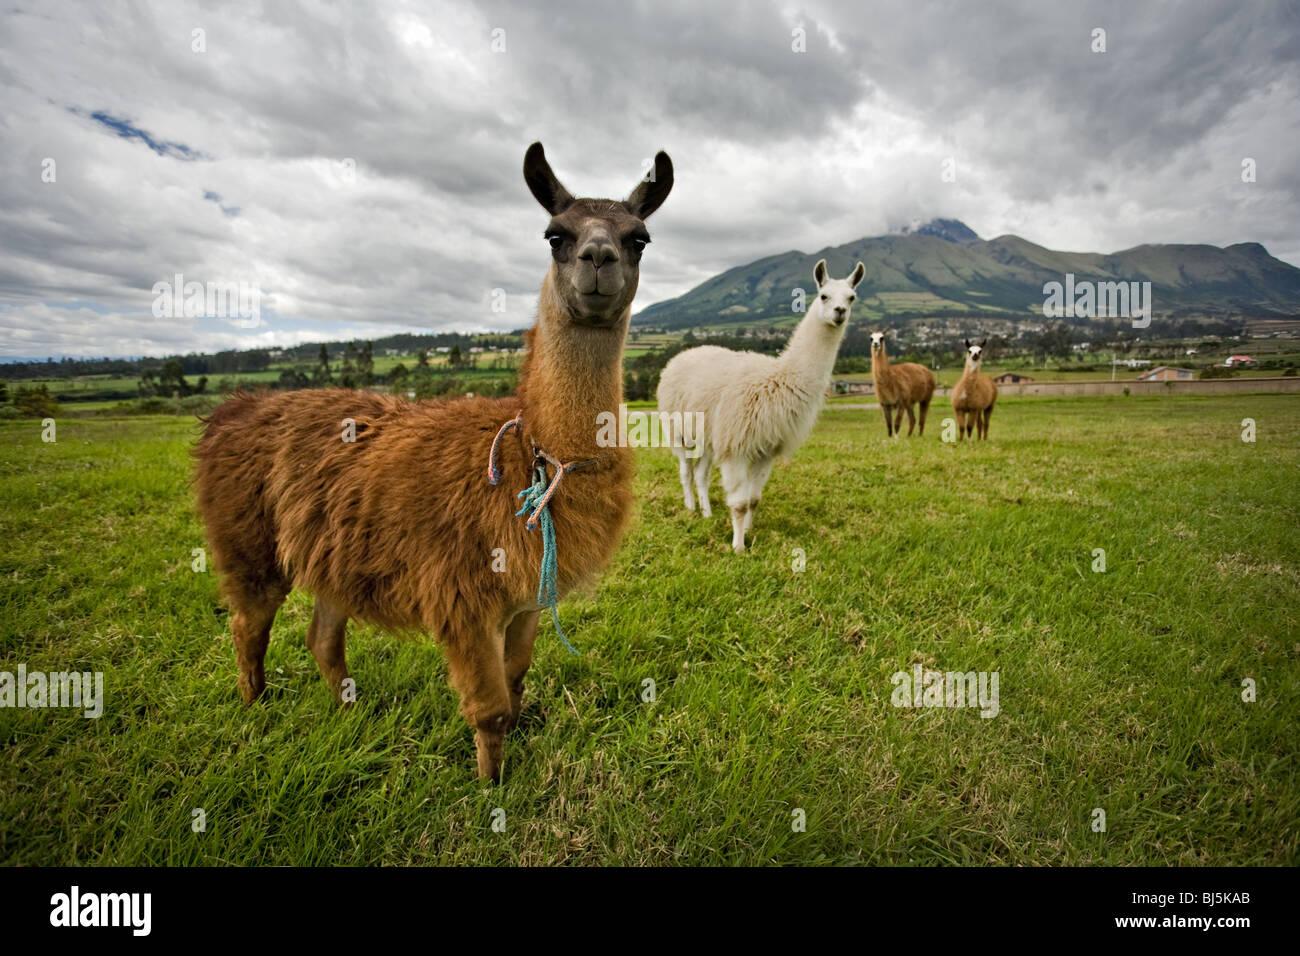 Curious llamas in the countryside of Ecuador, South America - Stock Image